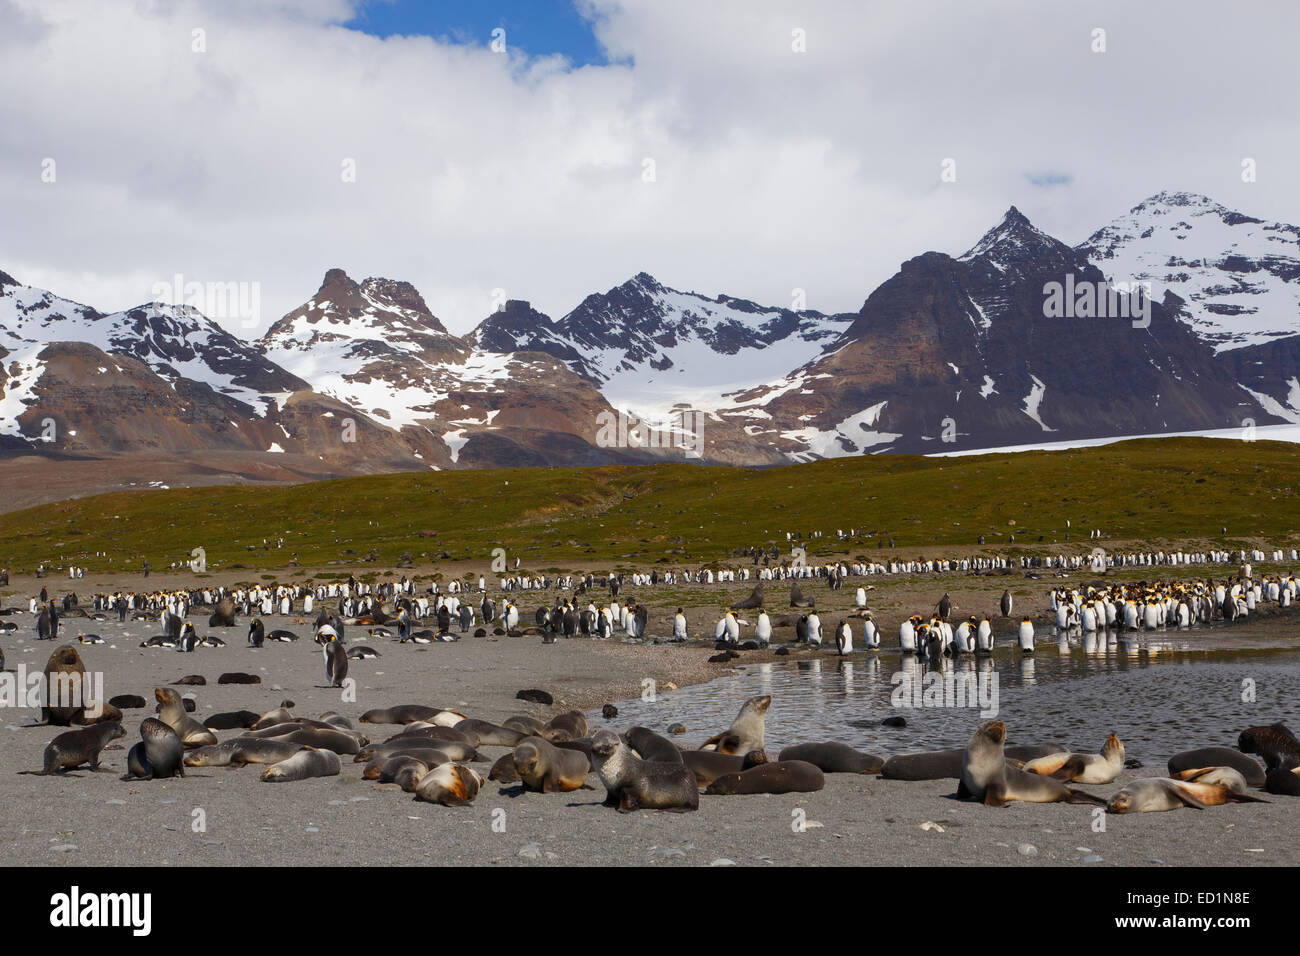 Salisbury Plain, South Georgia, Antarctica. Stock Photo